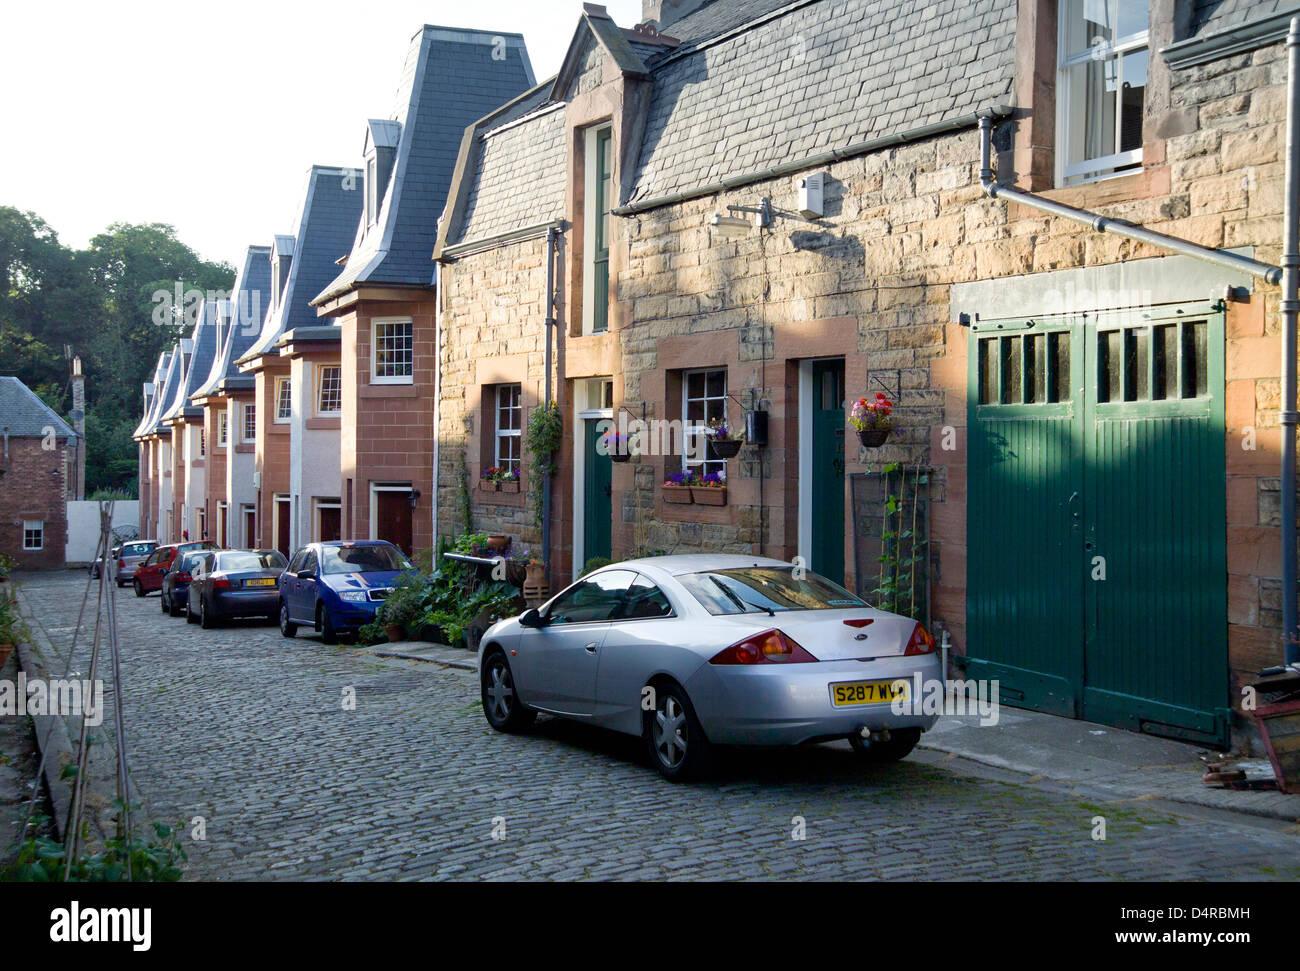 modern conversion in old dean village - Stock Image